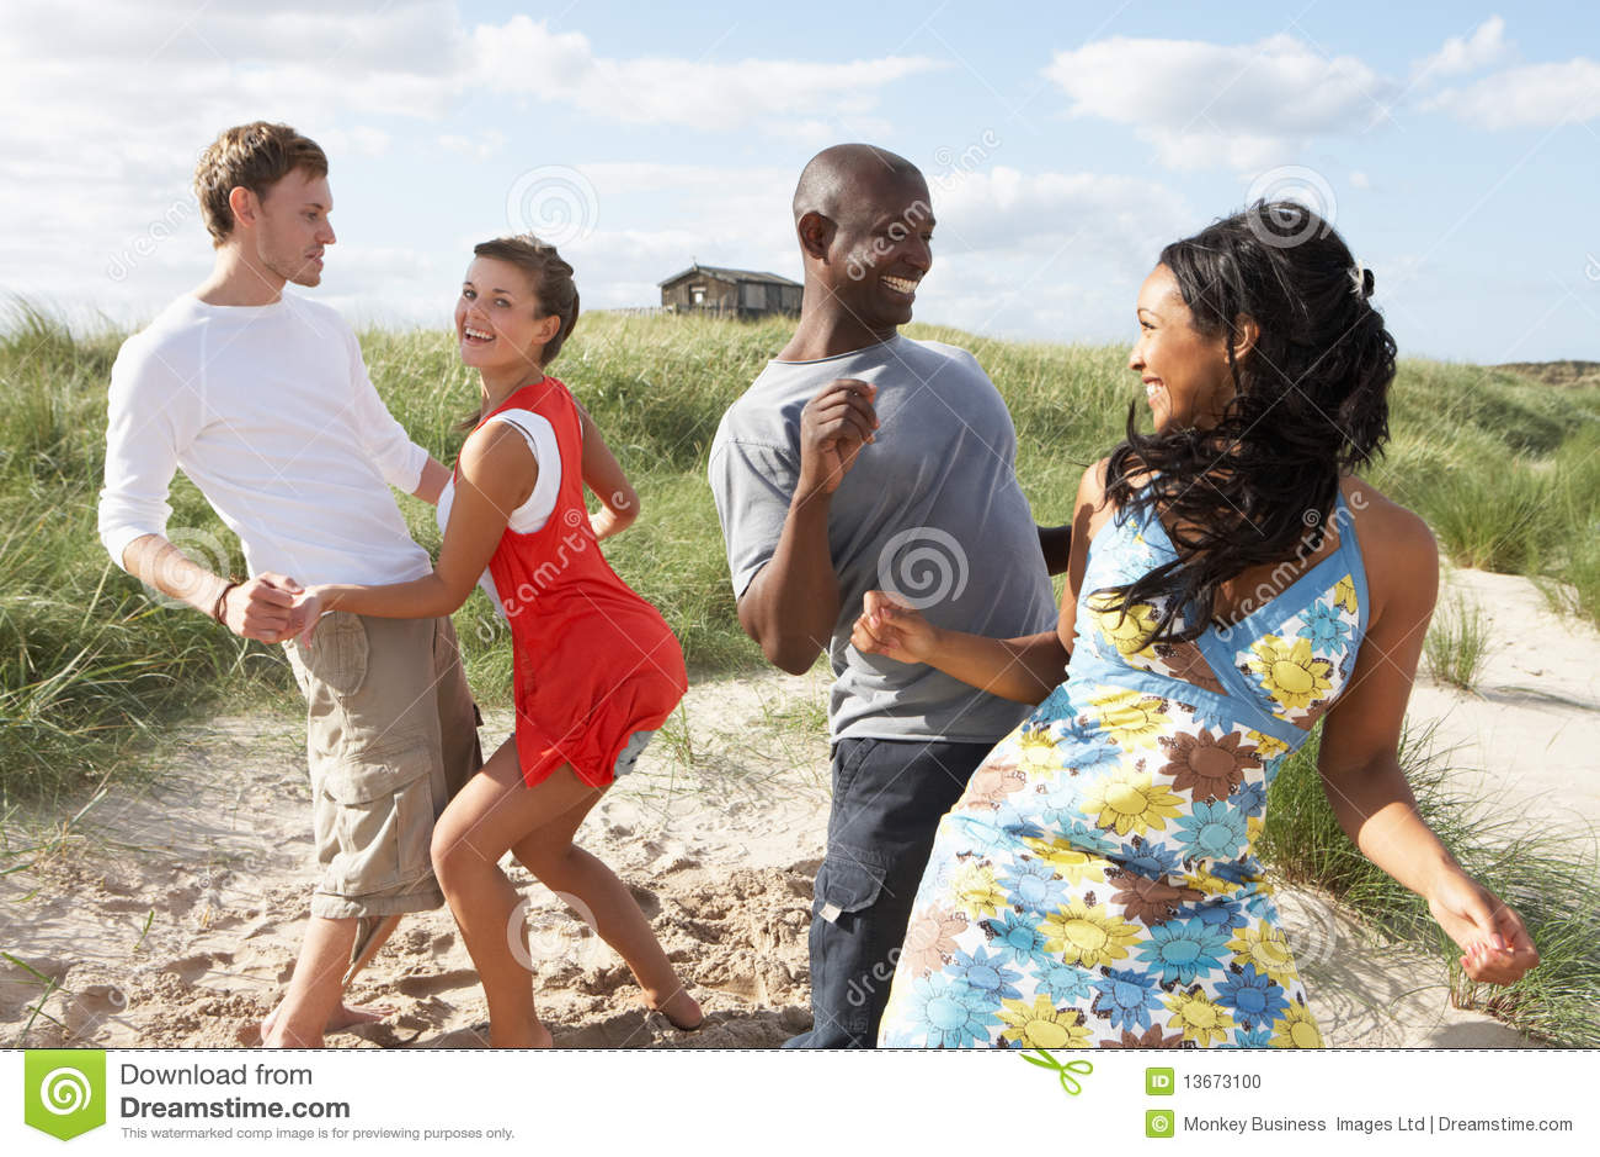 man and woman couple having fun dancing on a beach stock photo